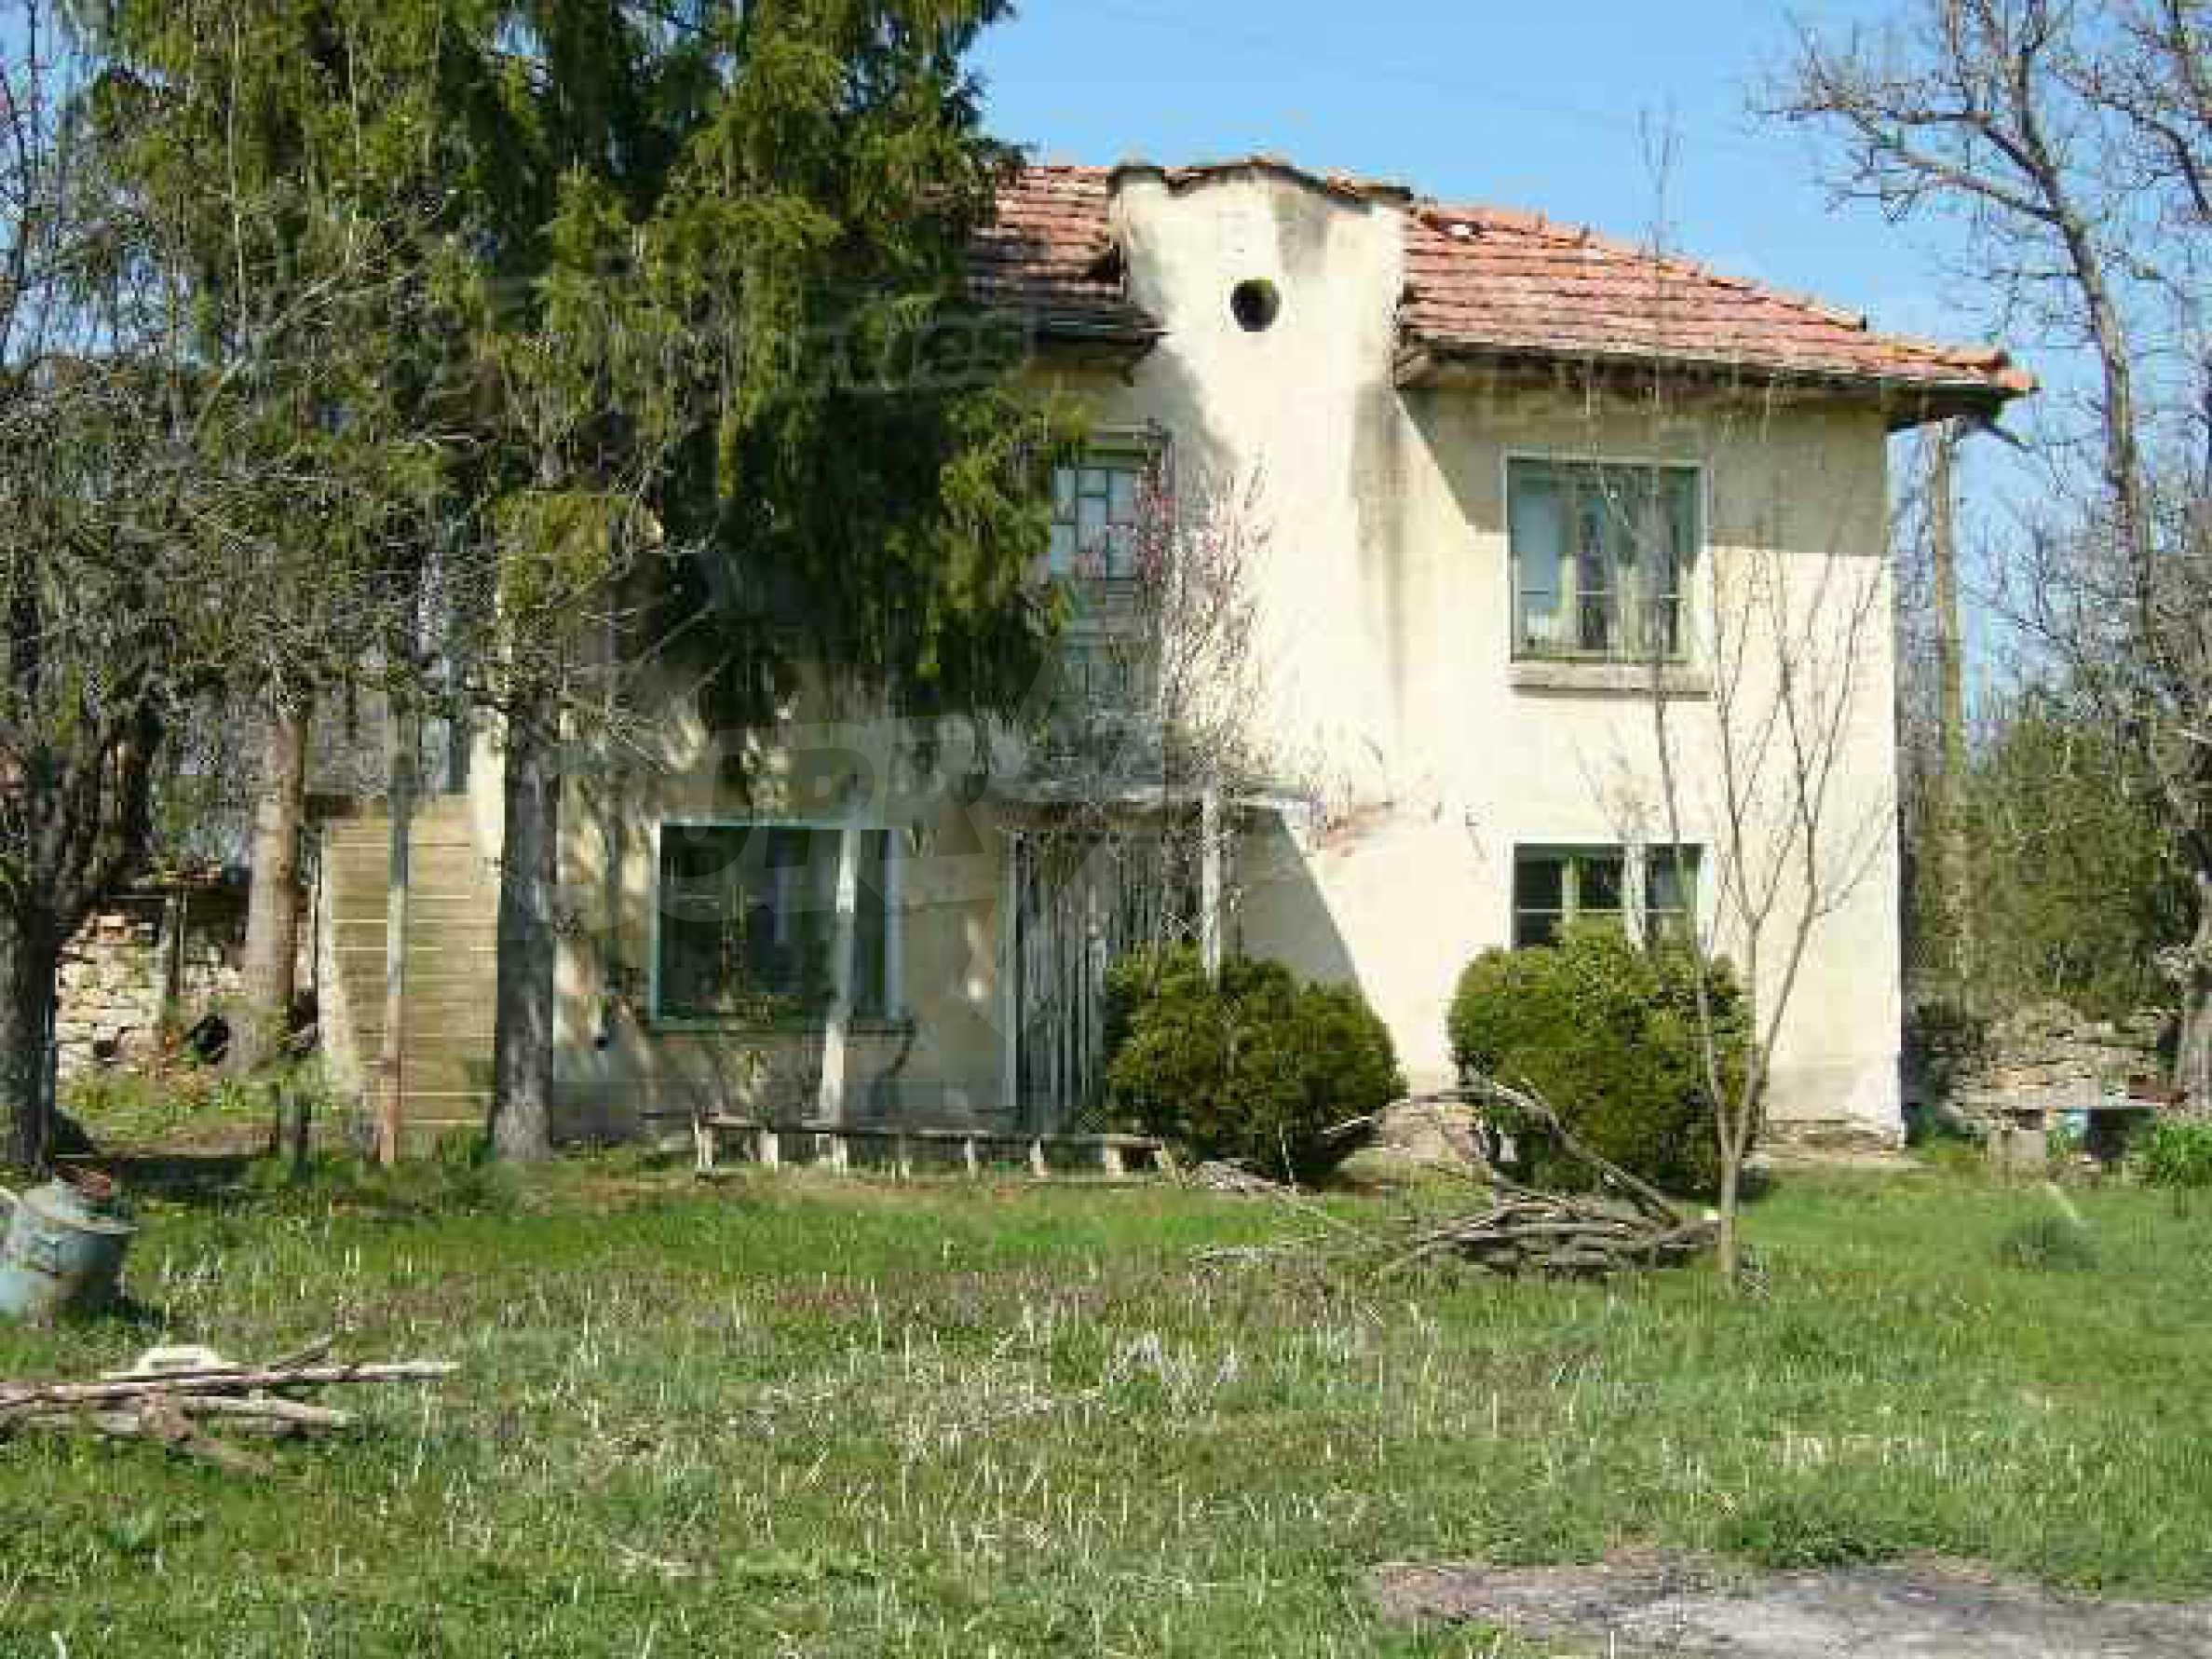 House for sale near Sevlievo and Lovech